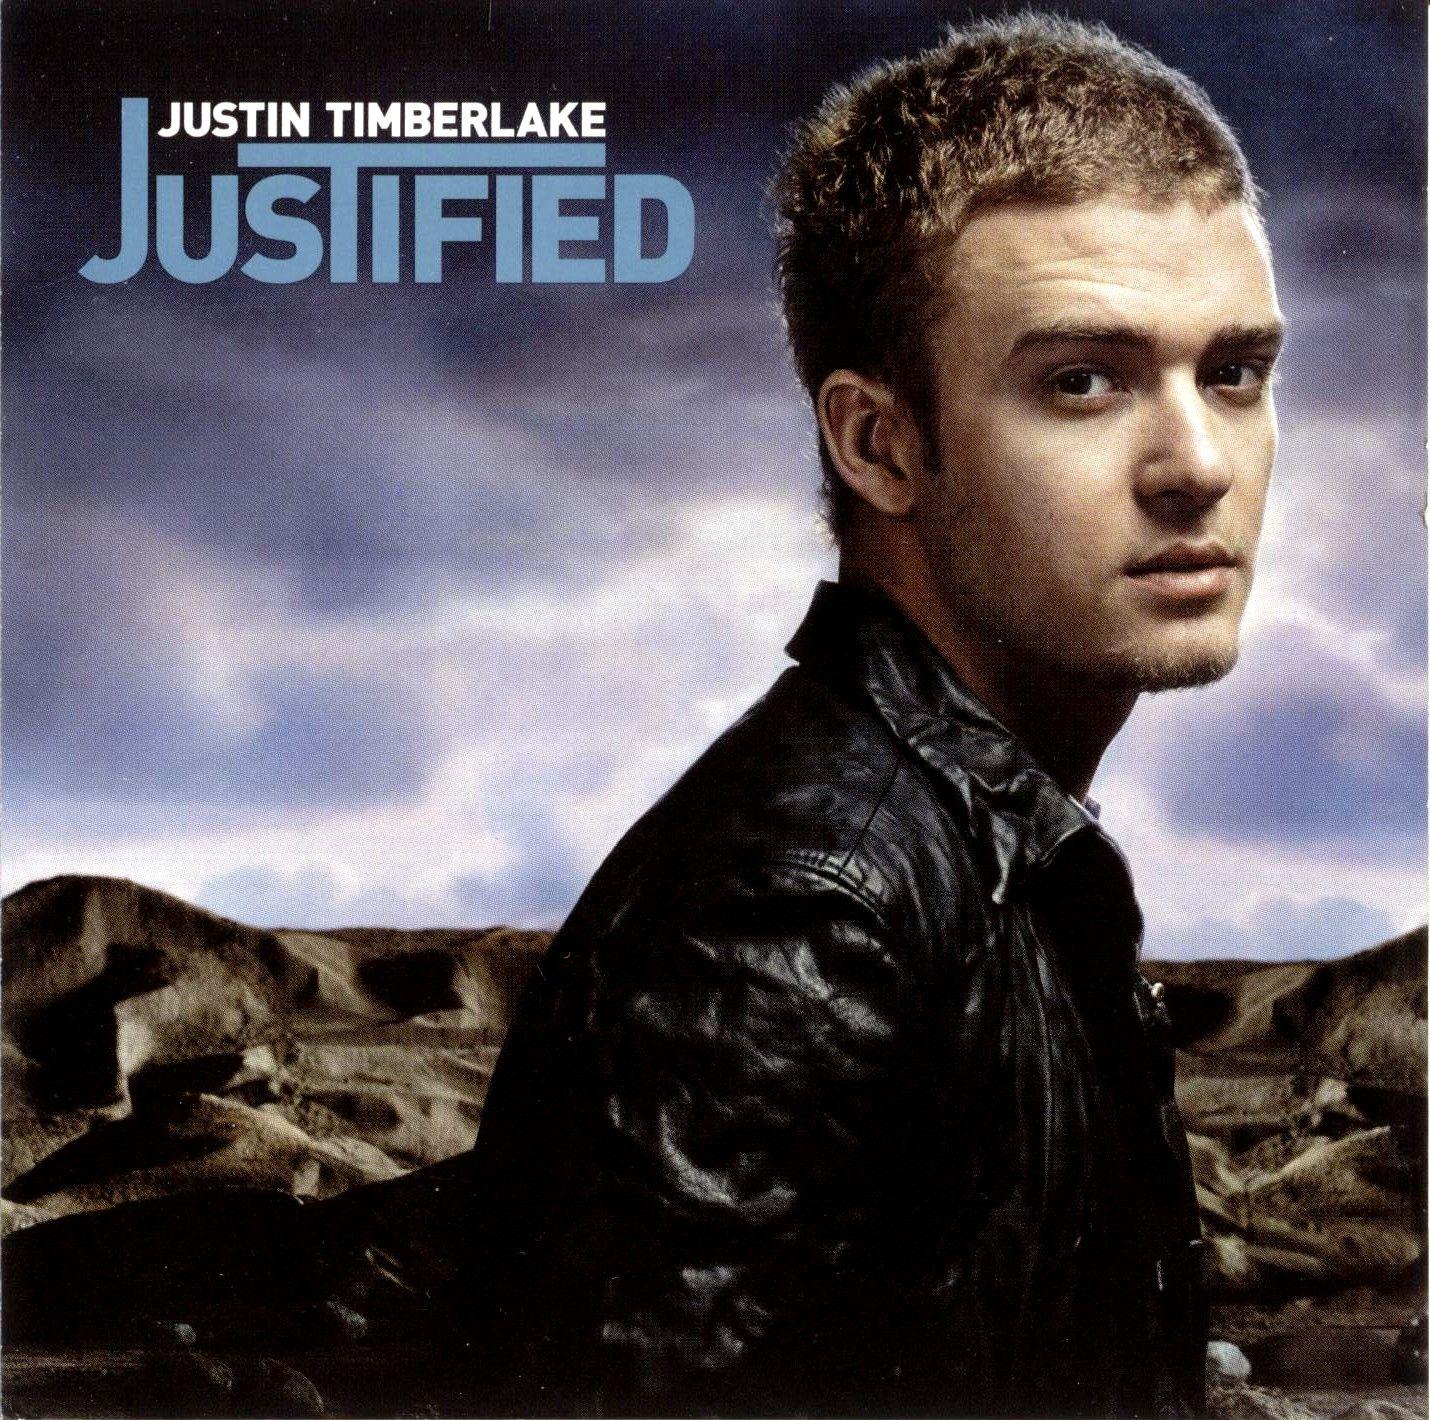 Justin Timberlake - Justified album cover